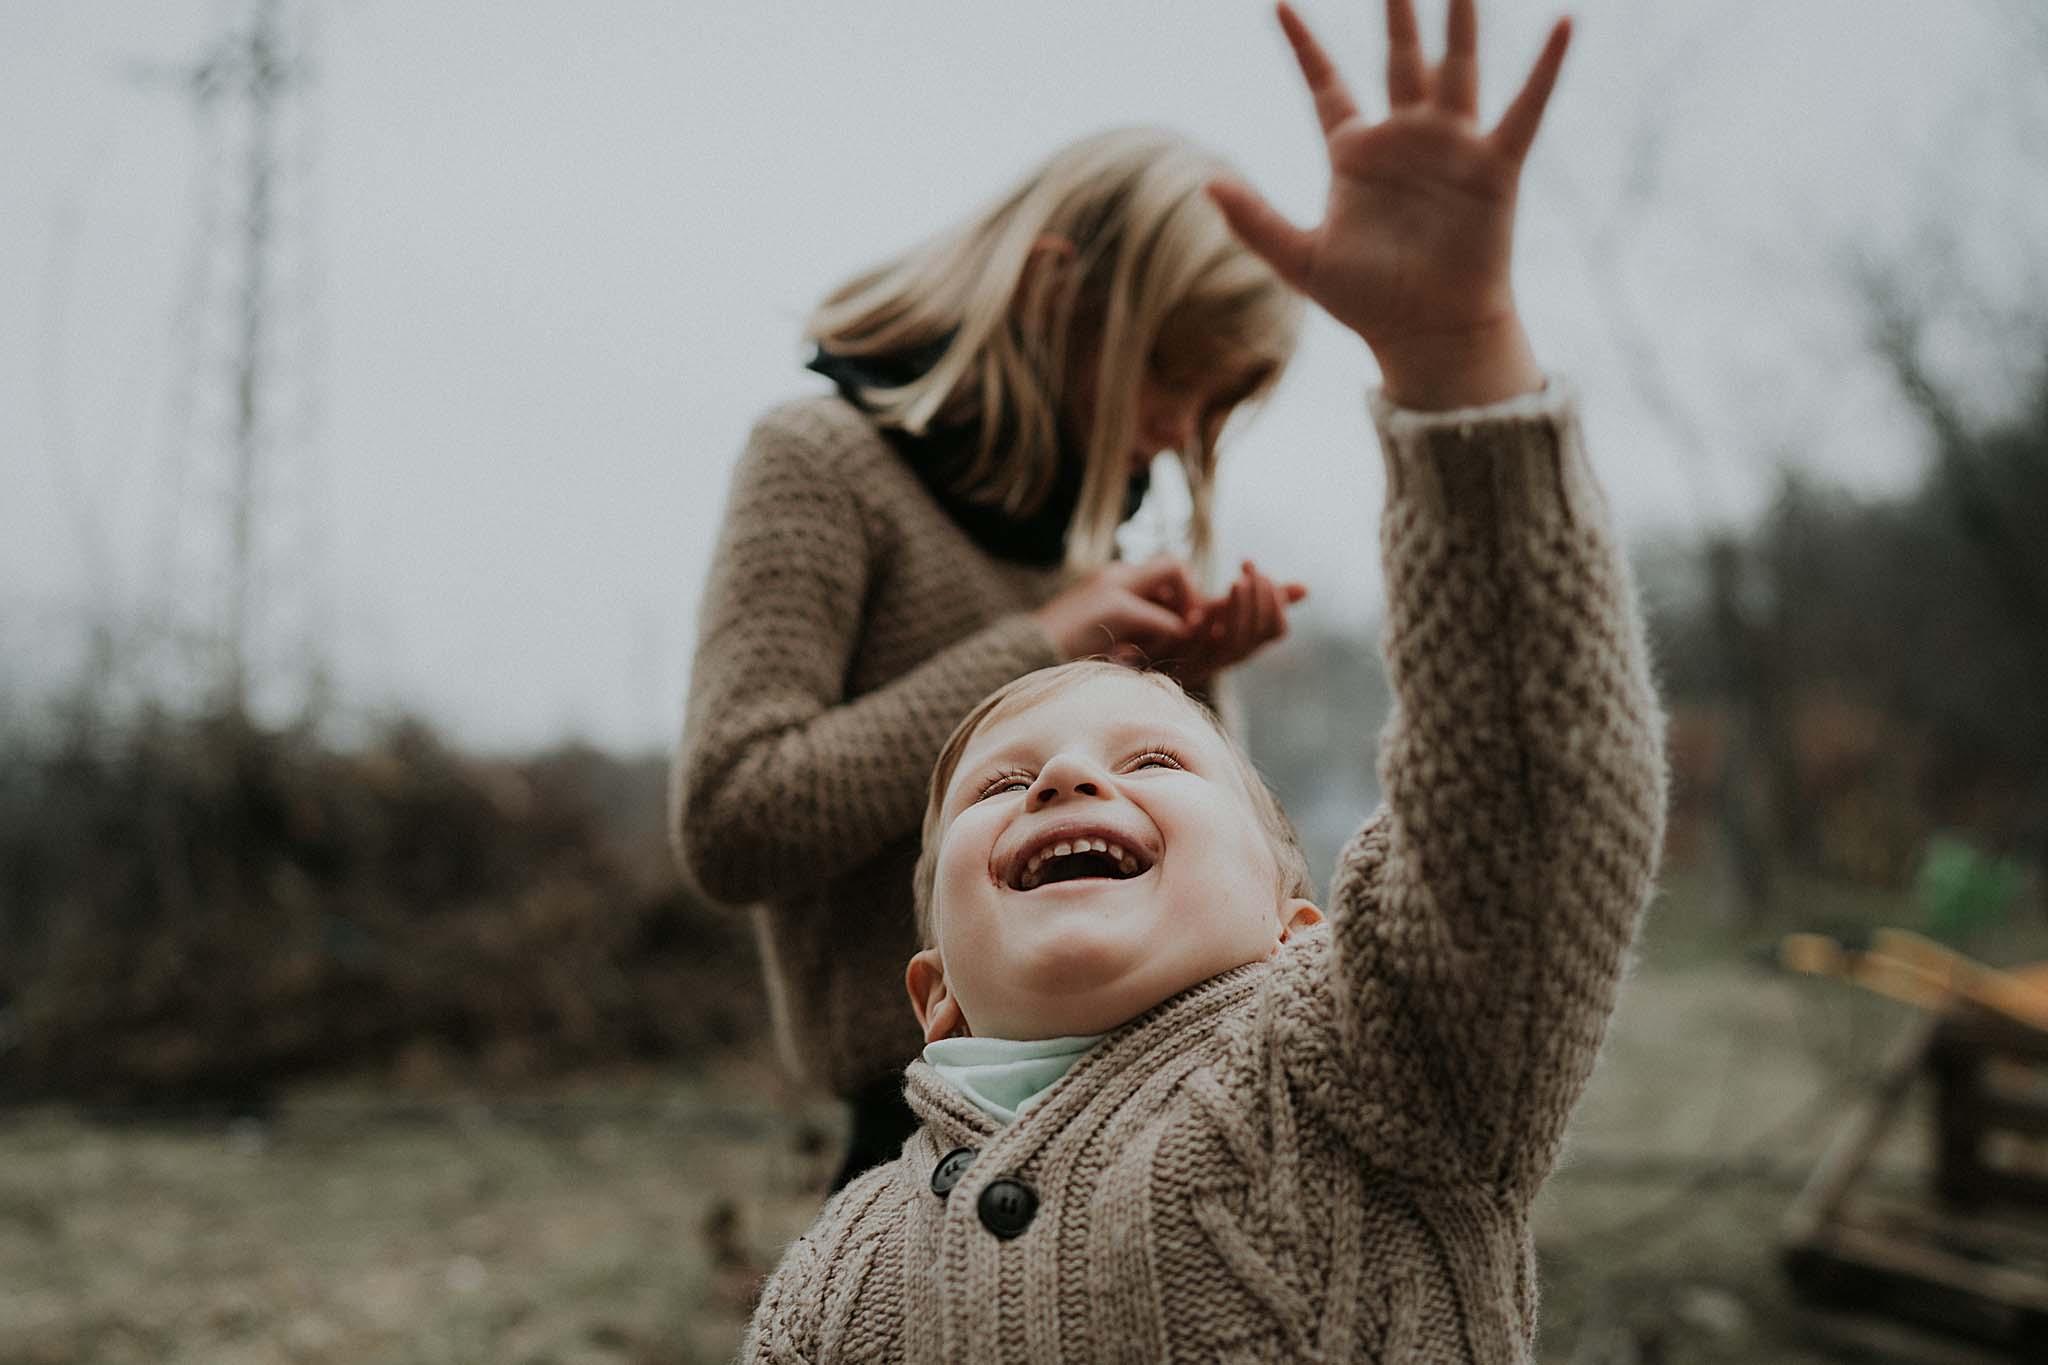 Семеен фотограф, детски фотограф, семейна фотосесия, детска фотосесия, фотограф, фотограф Варна, фотограф София, фотограф България, фотосесия, фотосесия на морето, детски снимки, коледна фотосесия